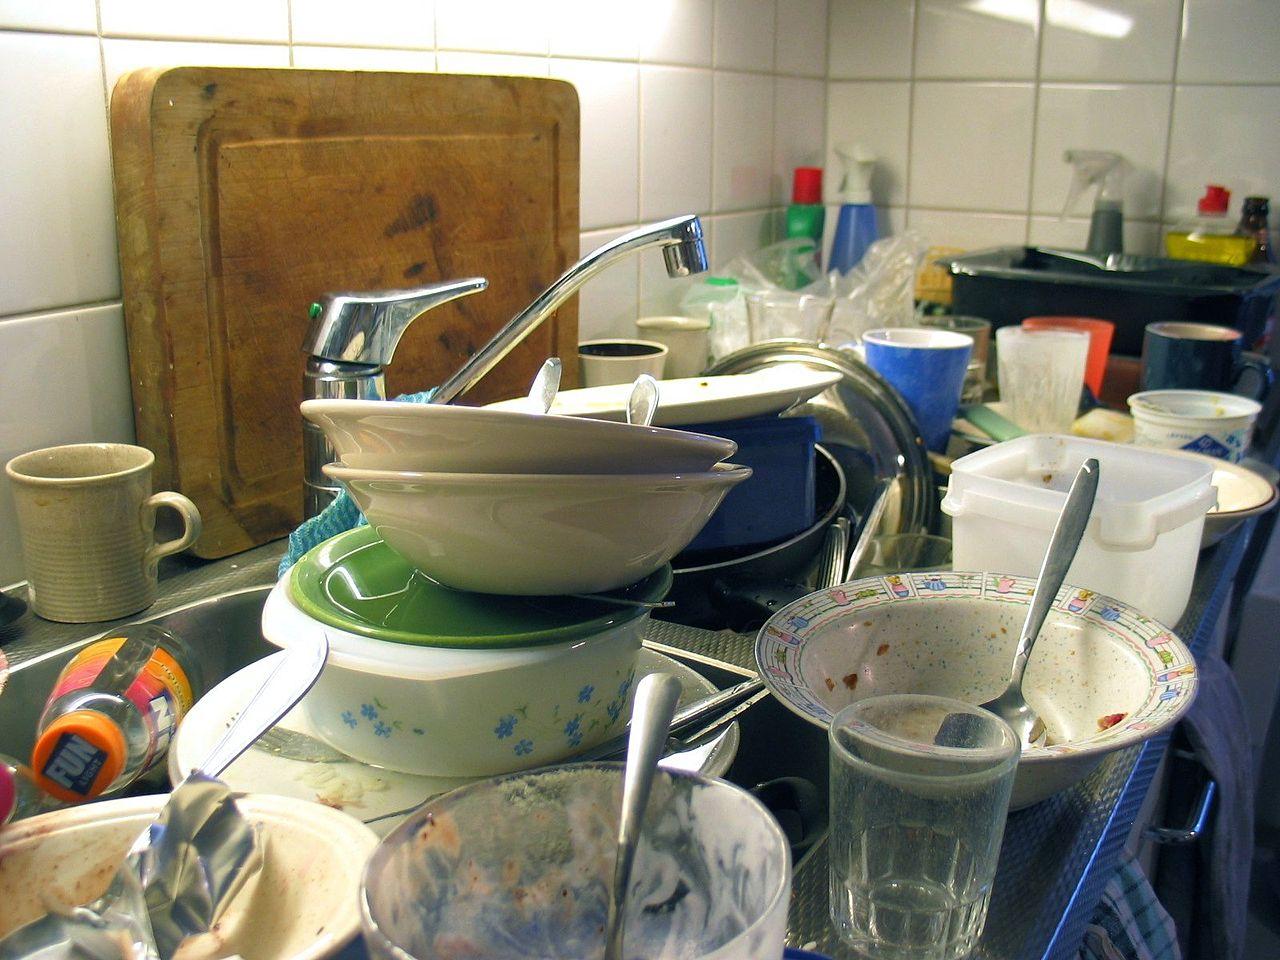 madre trabajadora platos sucios